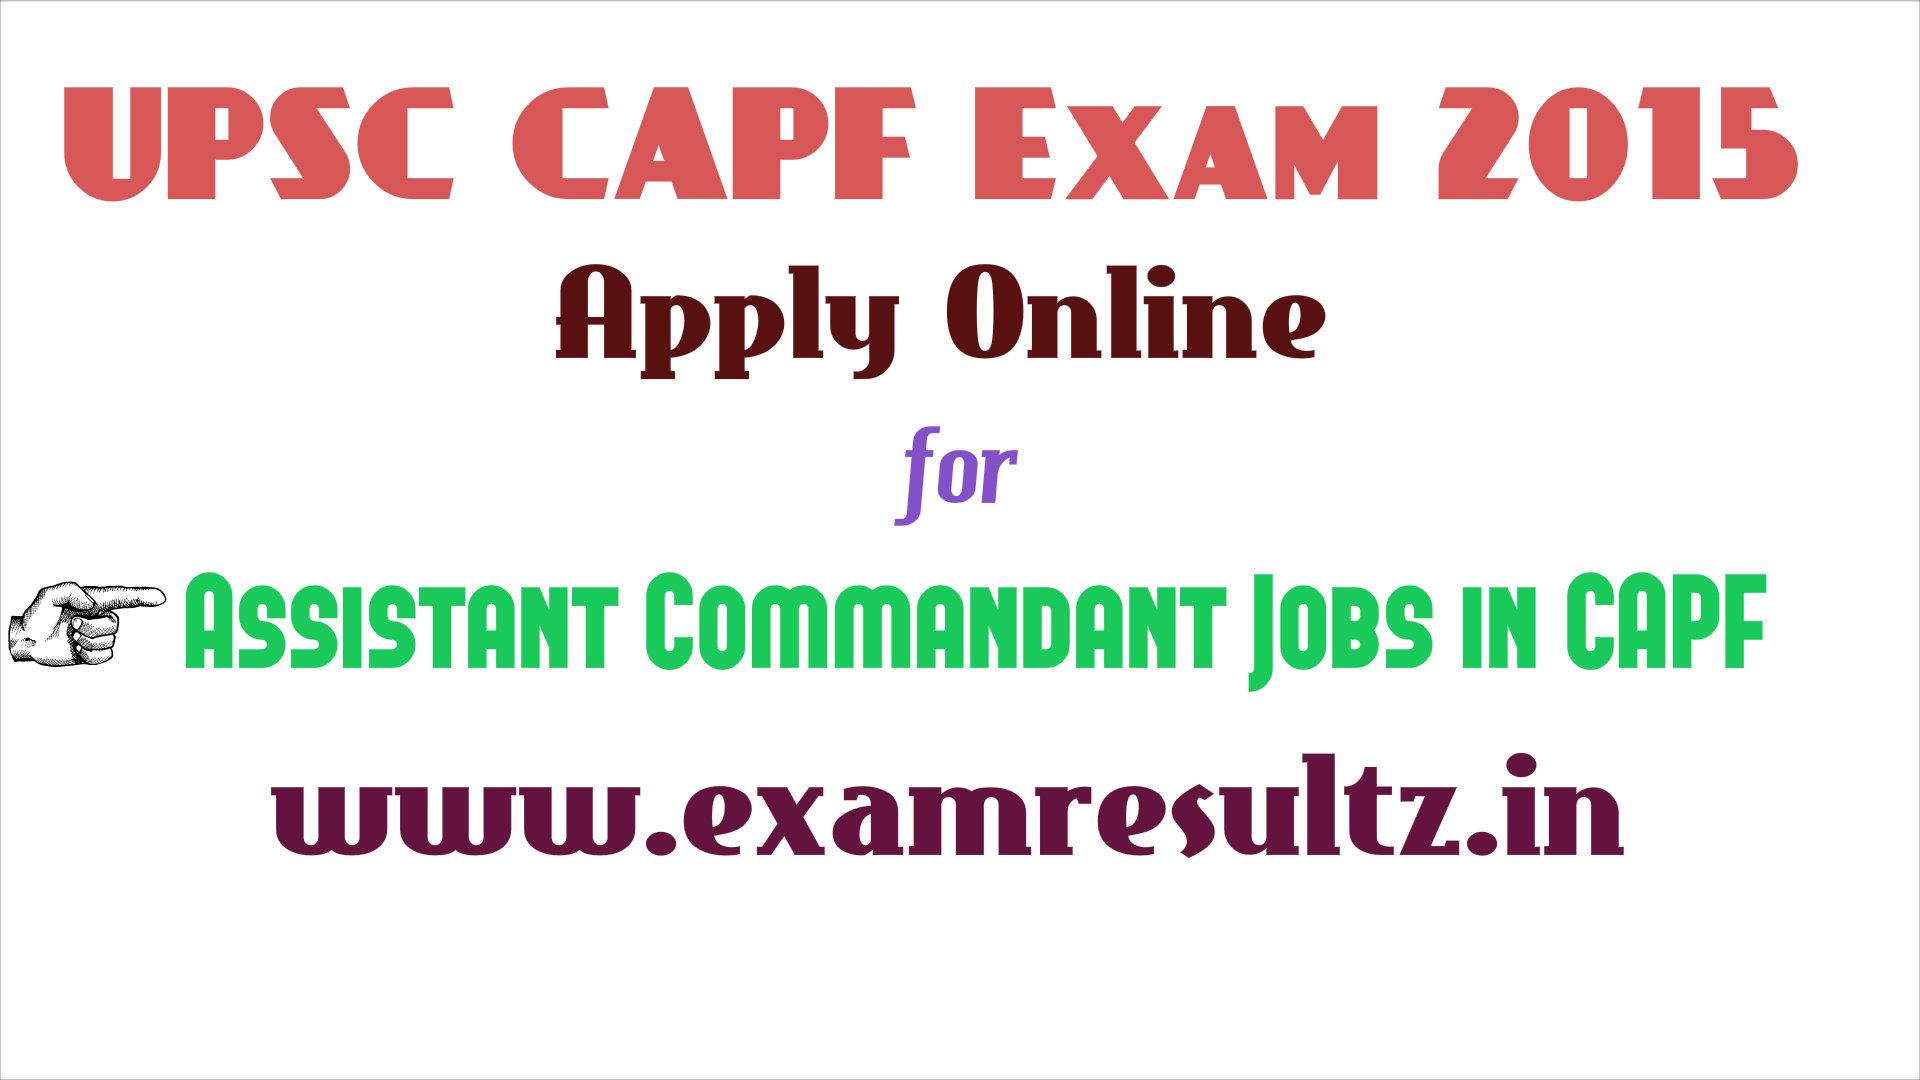 upsc capf examination 2015 exam dates